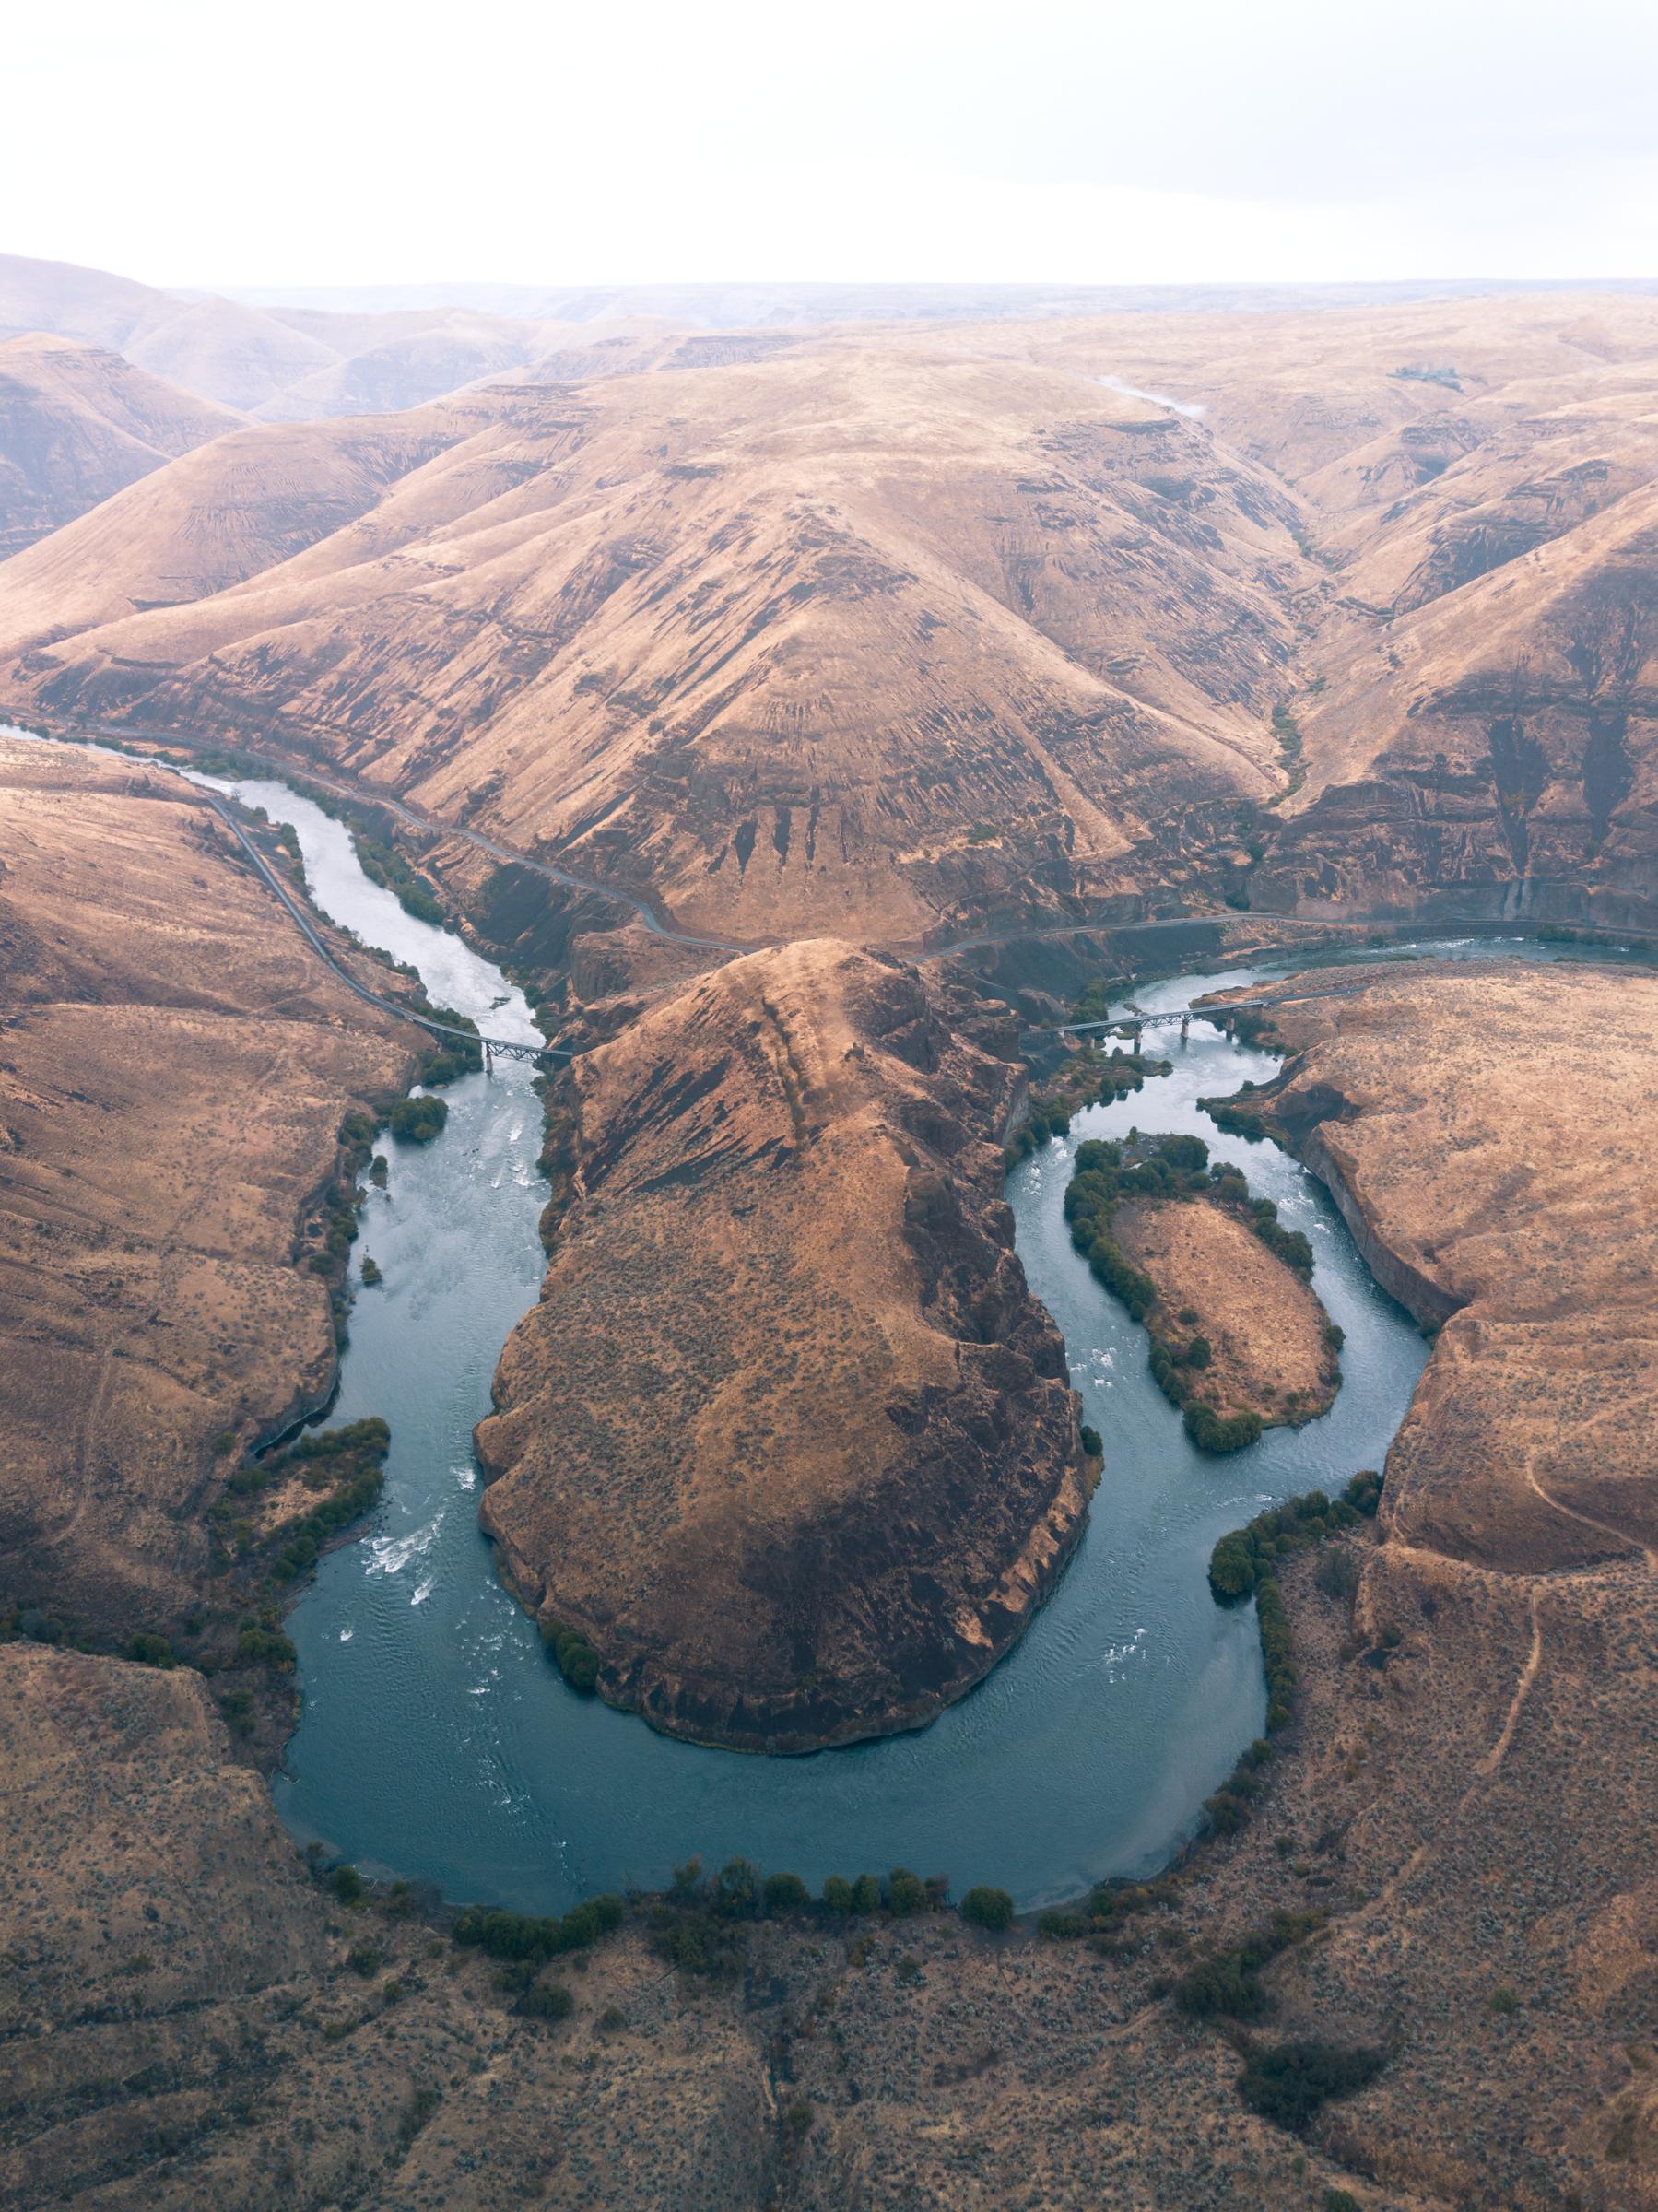 riverbend_typoland_aerial.jpg